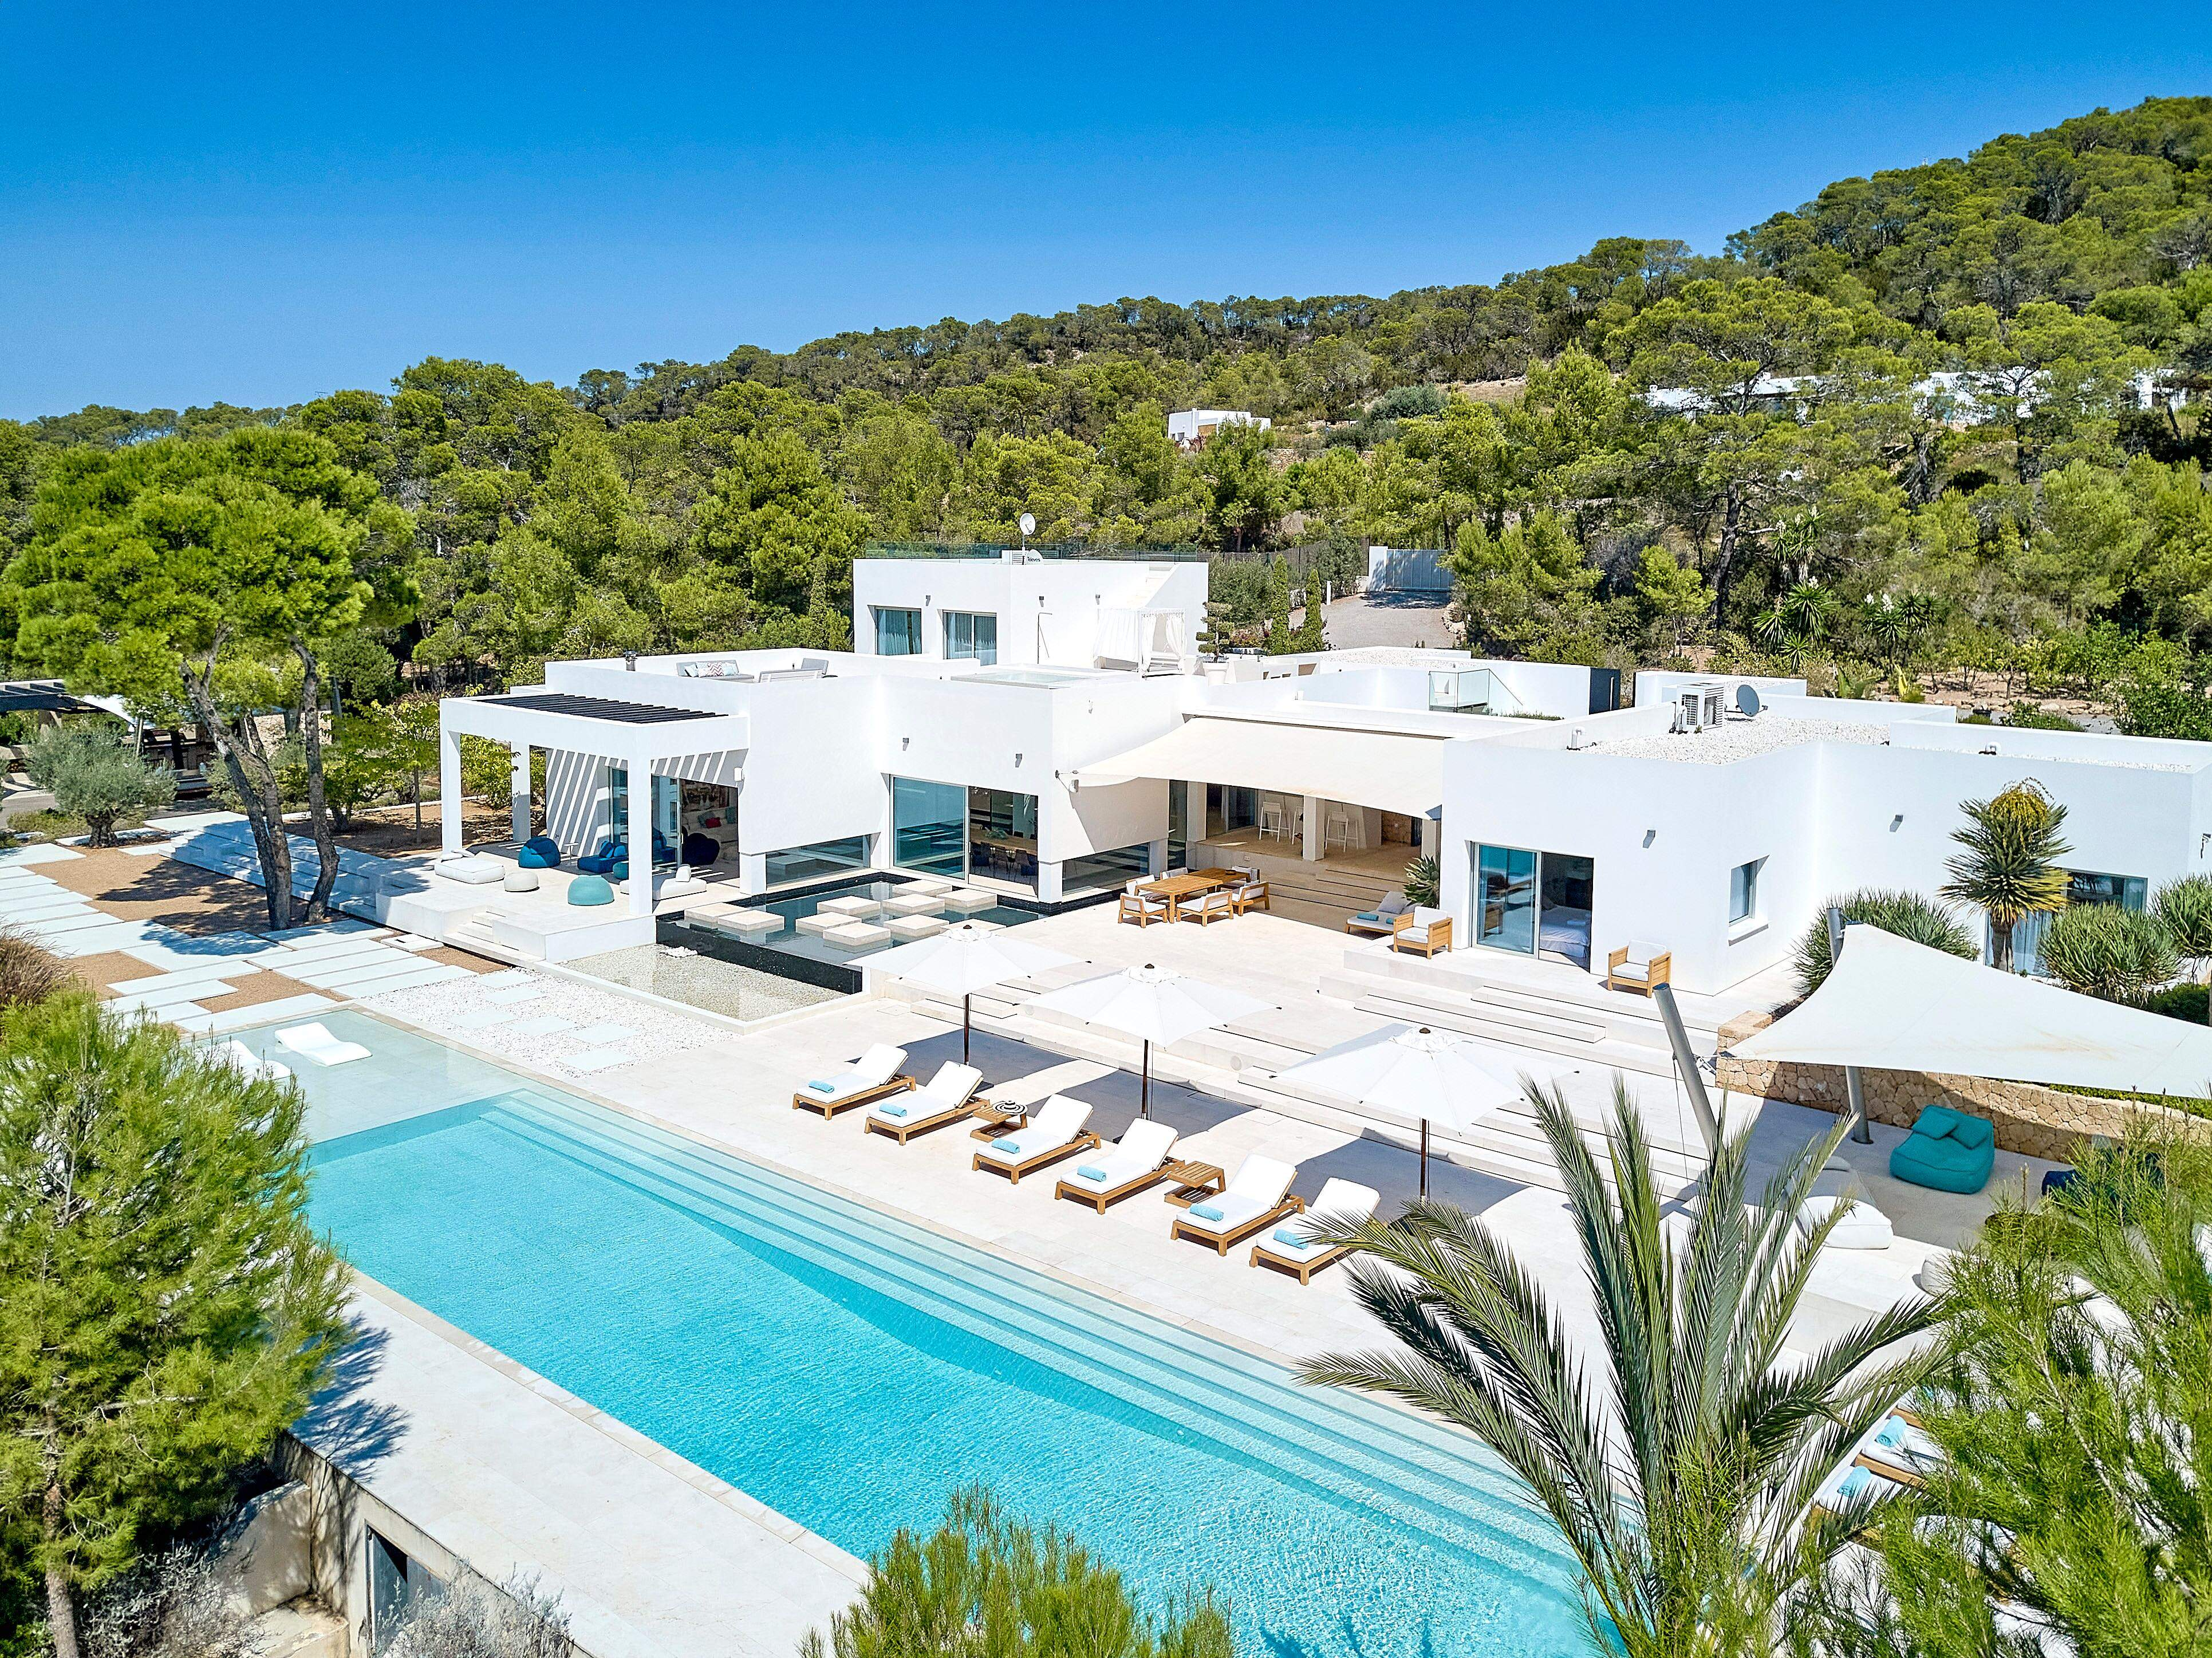 Villa Belinda In Ibiza Le Collectionist